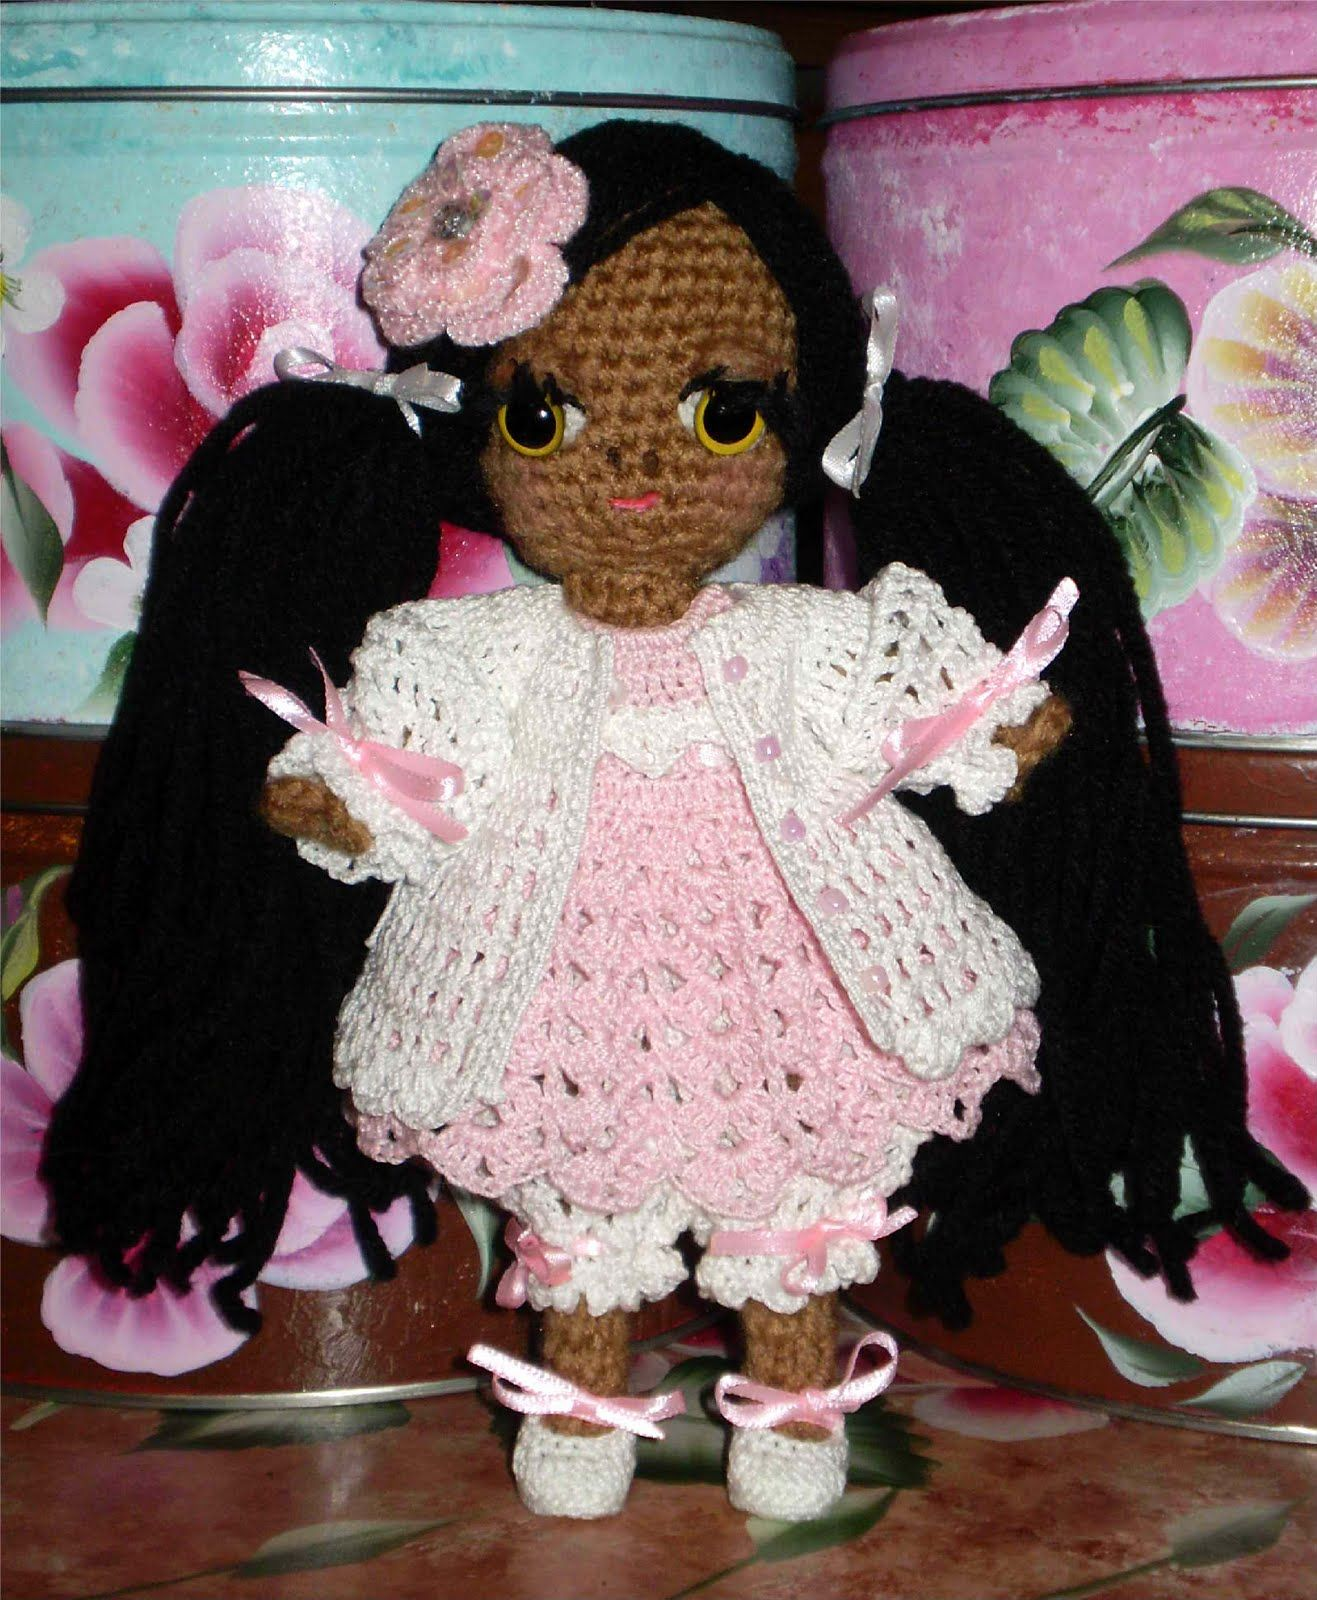 Crochet patterns free crochet patterns barbie doll clothing crochet patterns free crochet patterns barbie doll clothing free crochet patterns bankloansurffo Choice Image